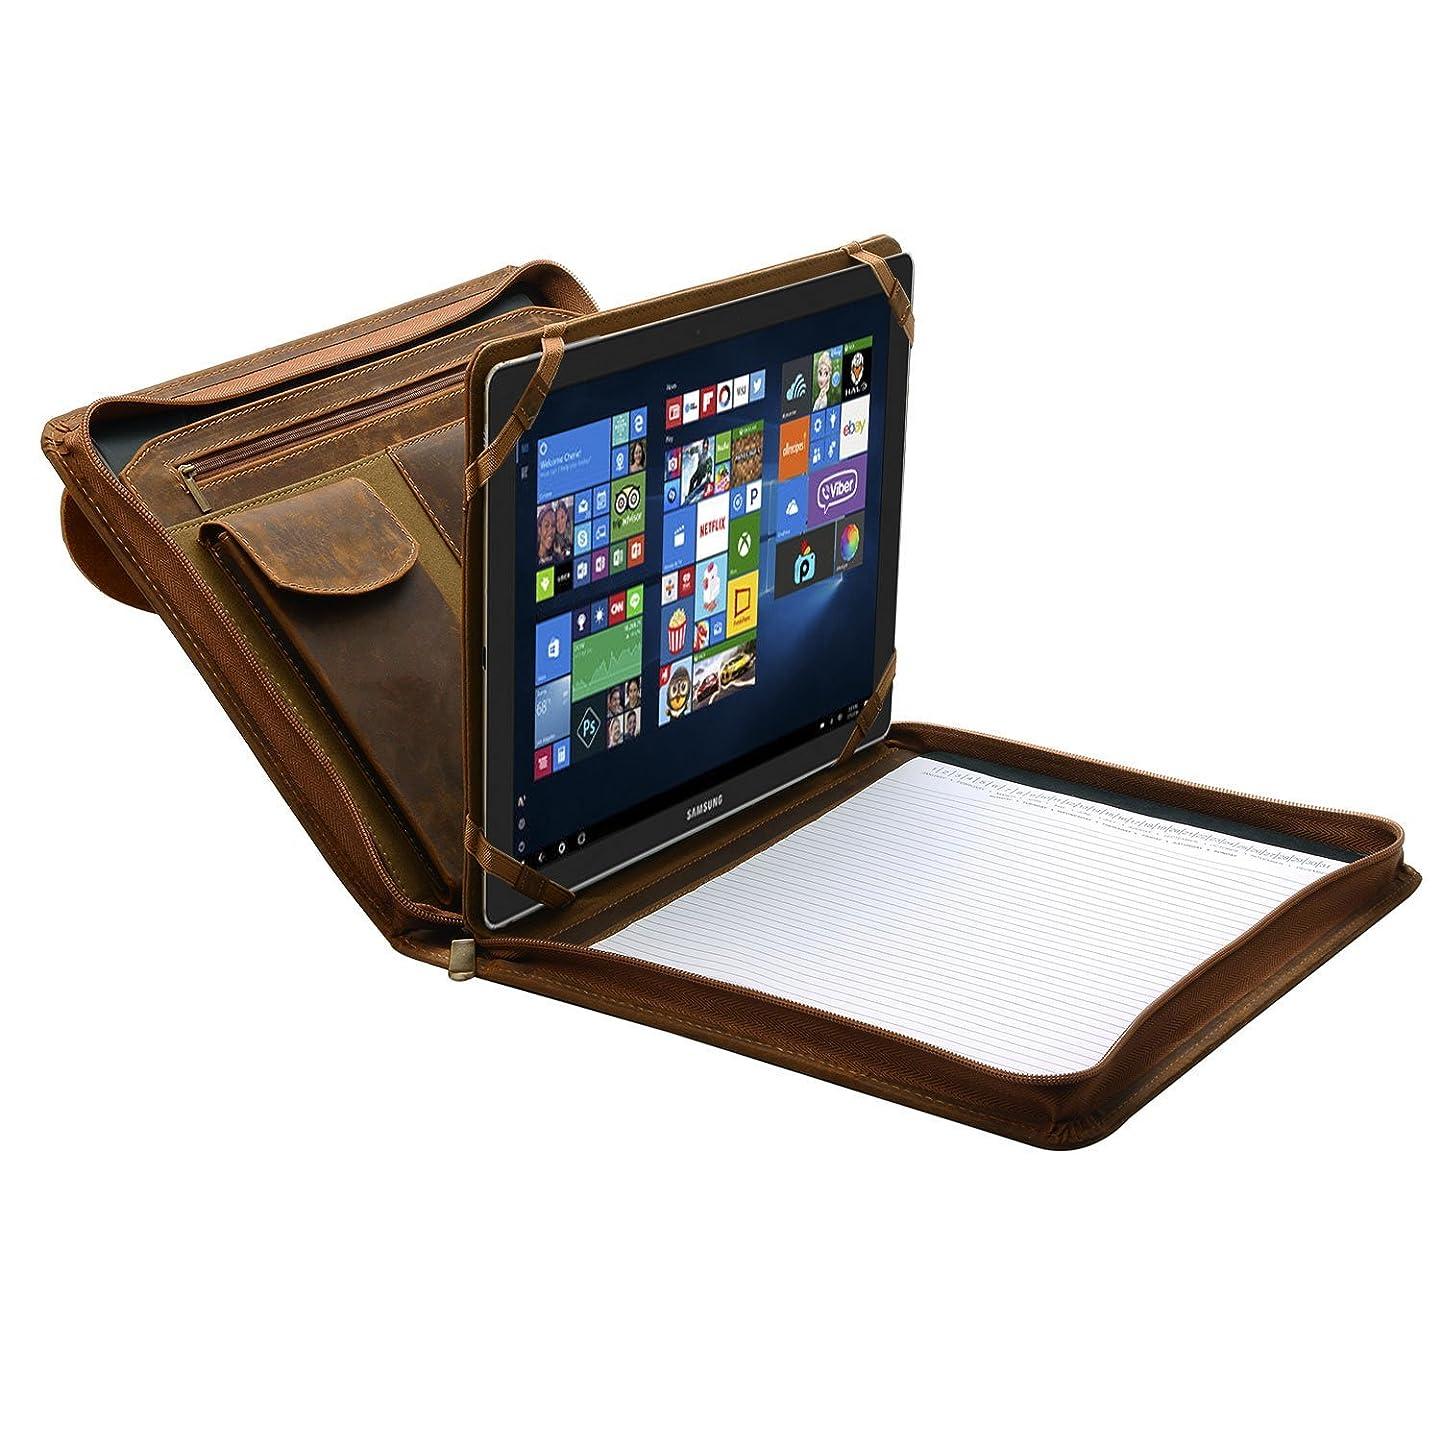 Samsung Portfolio Case, Organizer Padfolio with Large Pouch Pocket,for Samsung Galaxy TabPro S 12